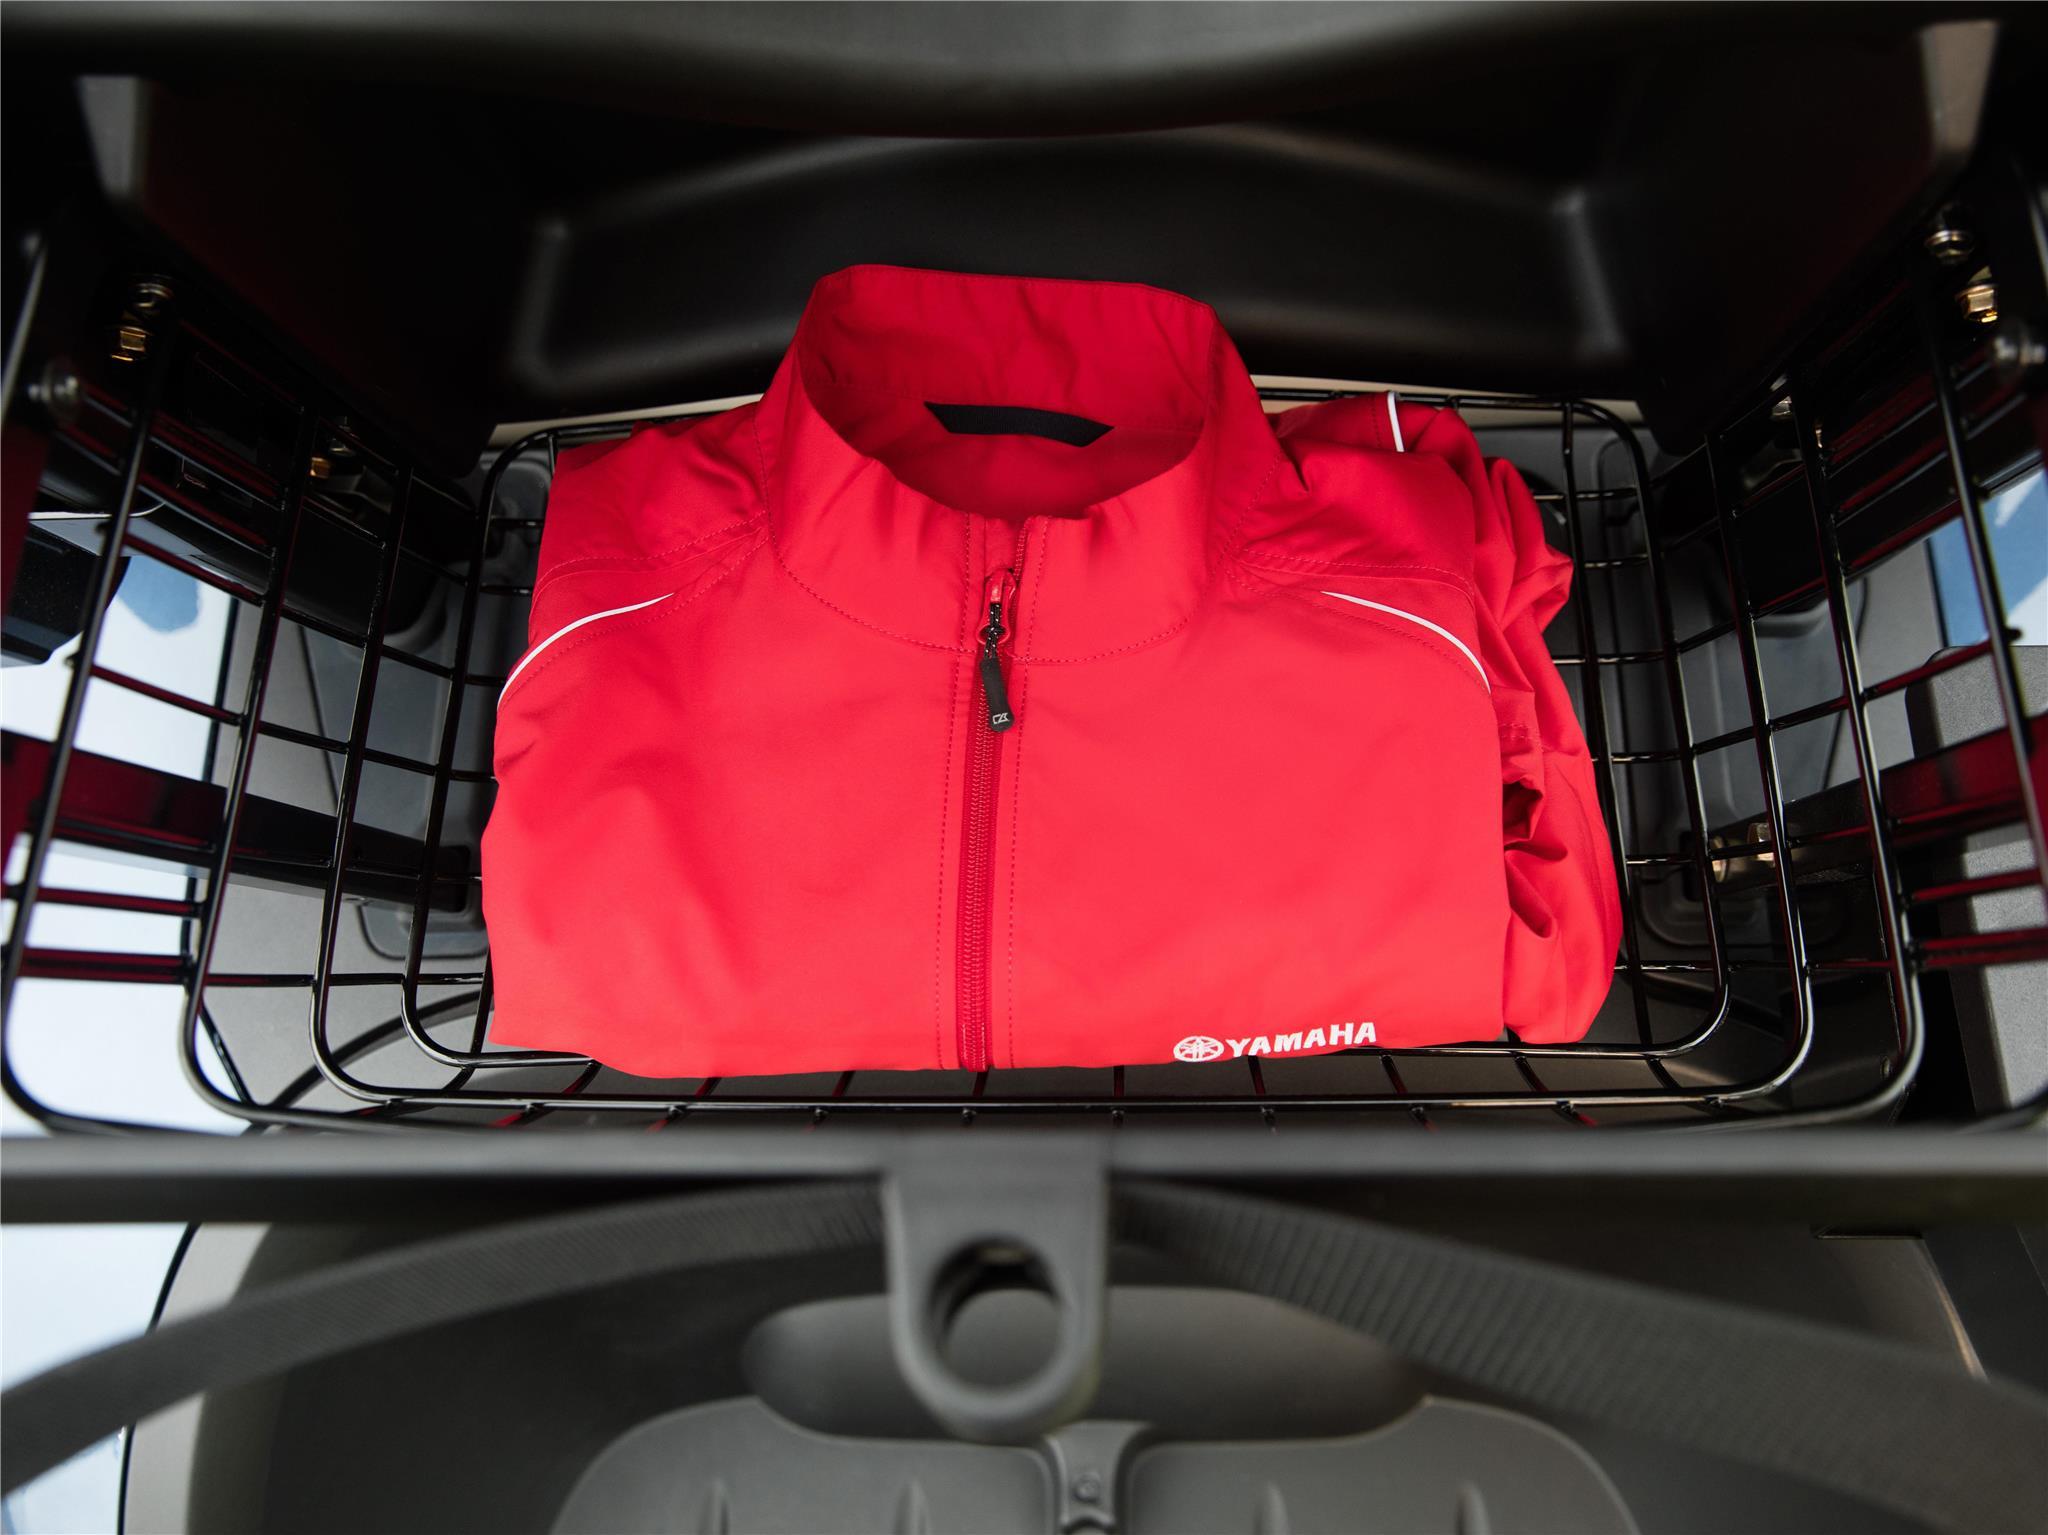 Consumer Golf Cart - LARGER SWEATER BASKET